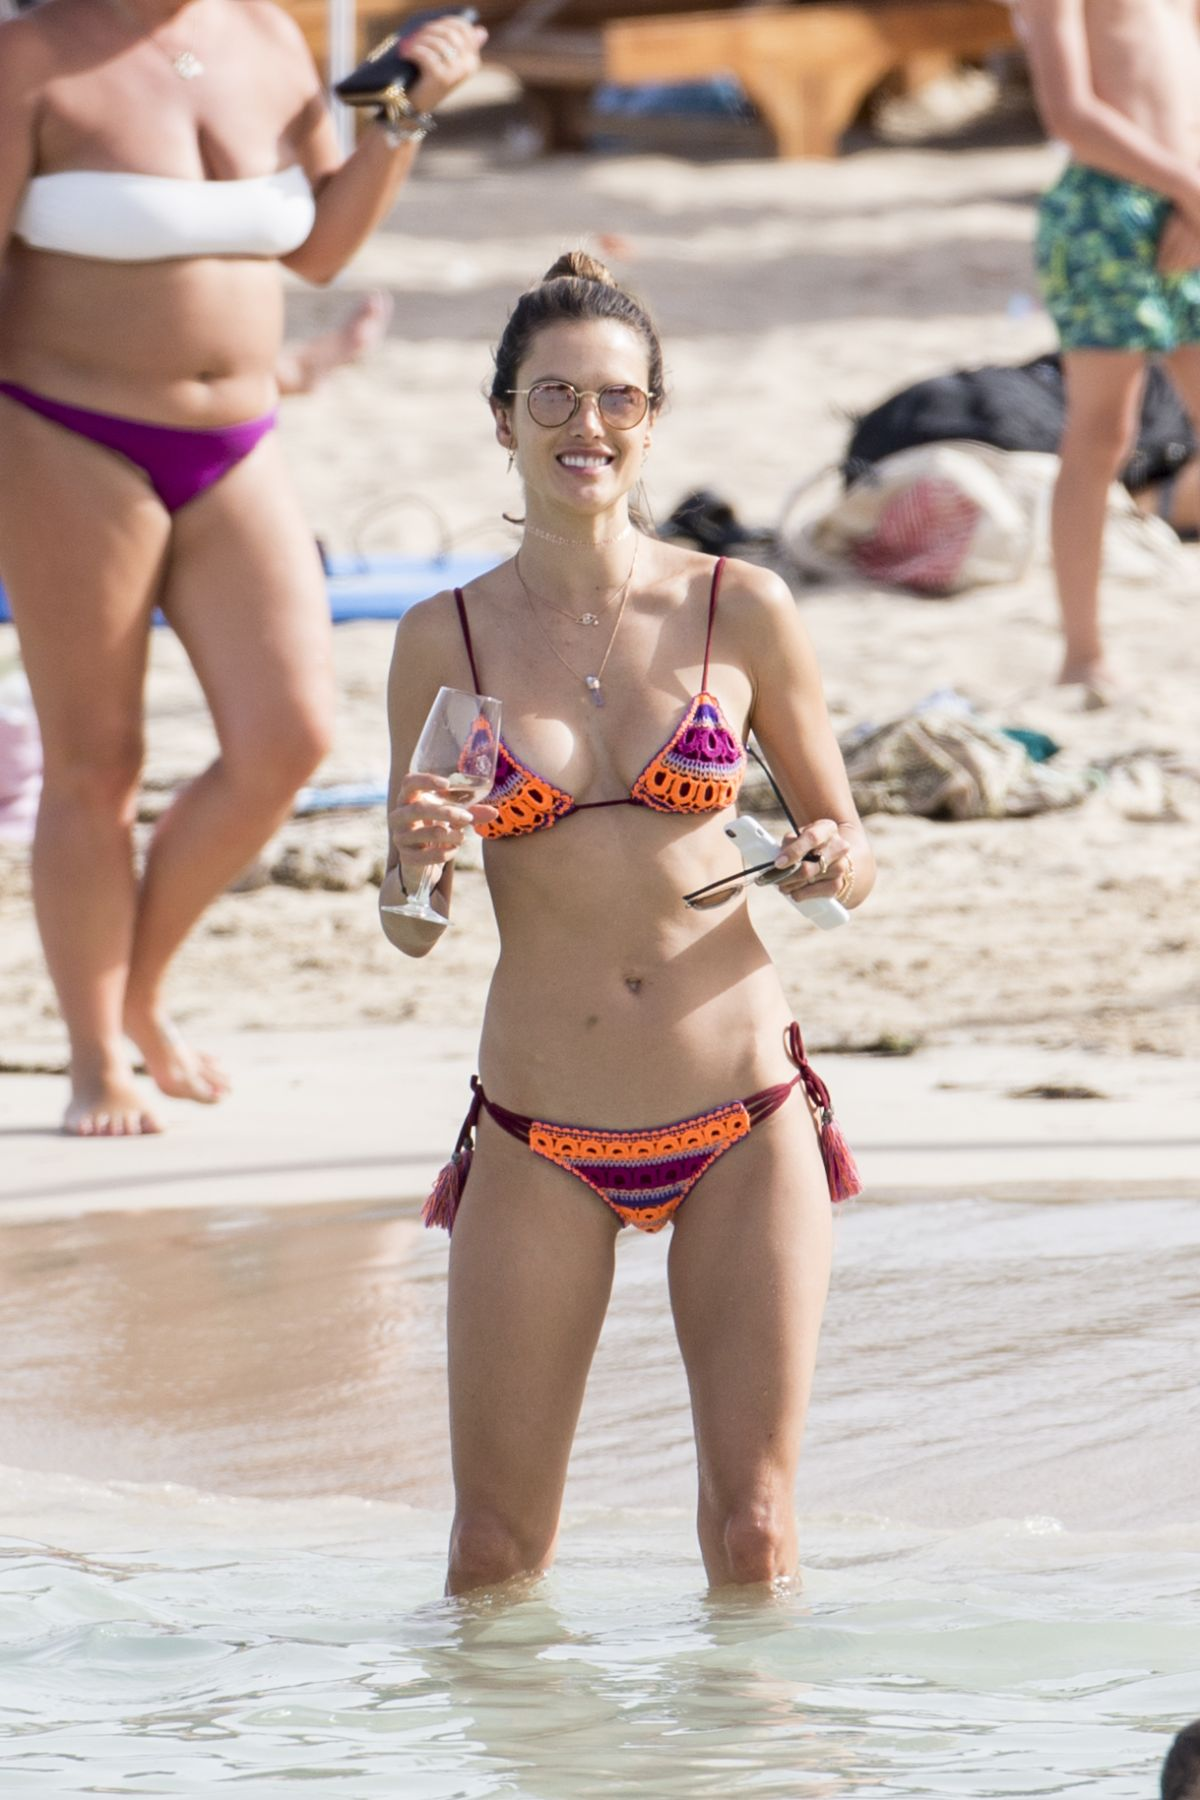 On Alessandra Beach In Bikini Ambrosio 07042016 The Ibiza ZwkXTOPiu